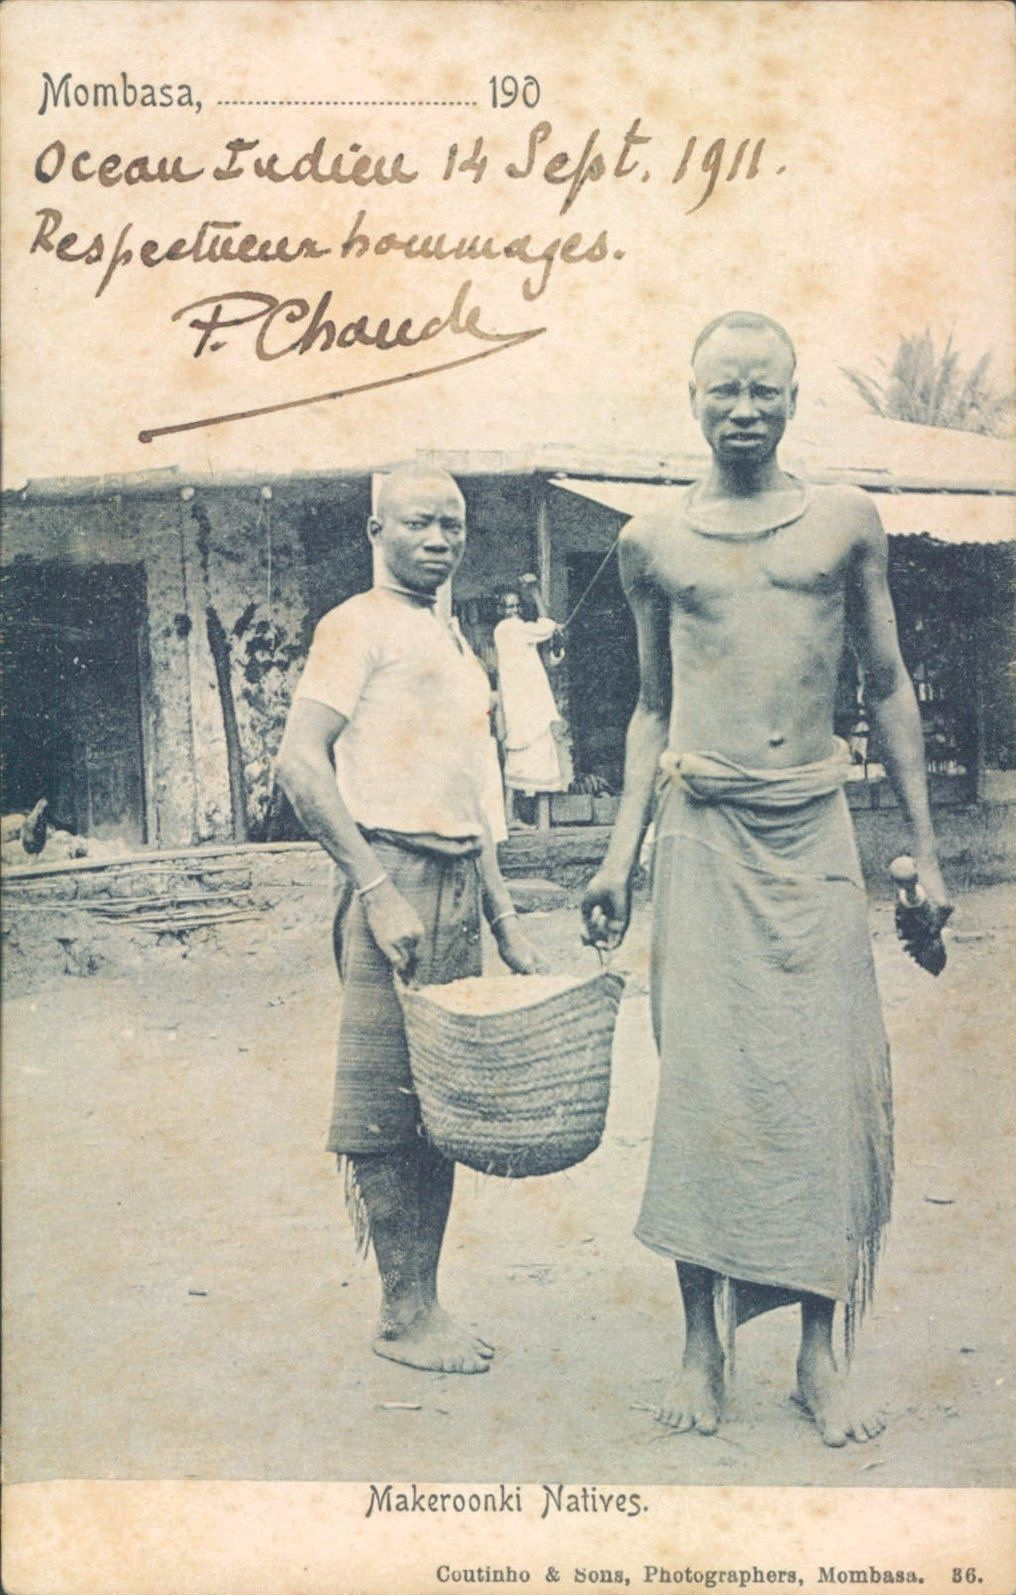 Makeroonki Natives Mombasa 1911 Makeroonki Natives Mombasa